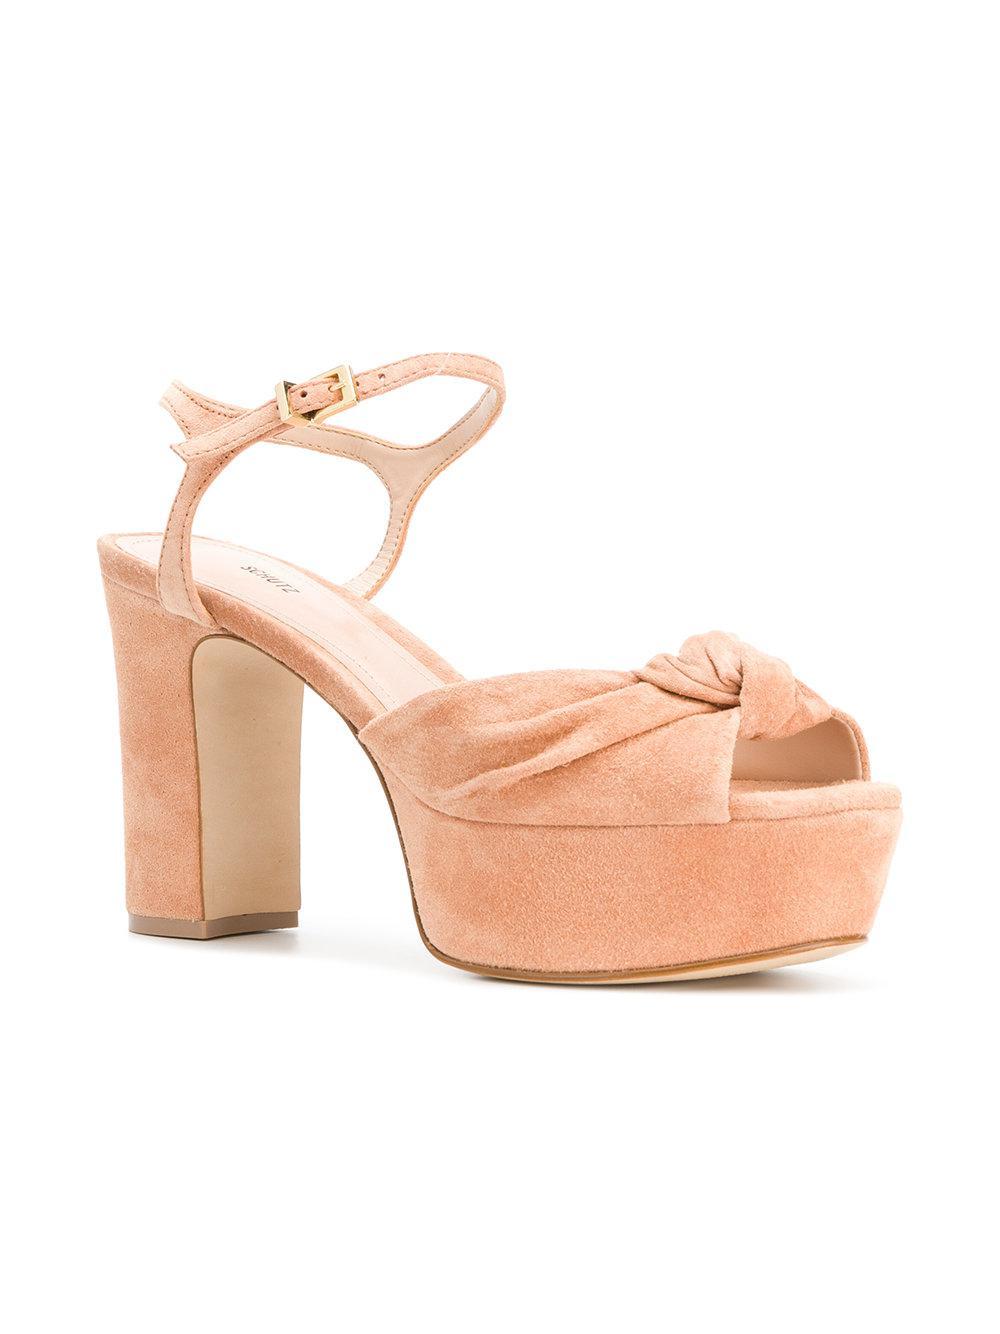 cheap sale outlet store Schutz slingback knot sandals cheap sale many kinds of jUiCvfSGbP